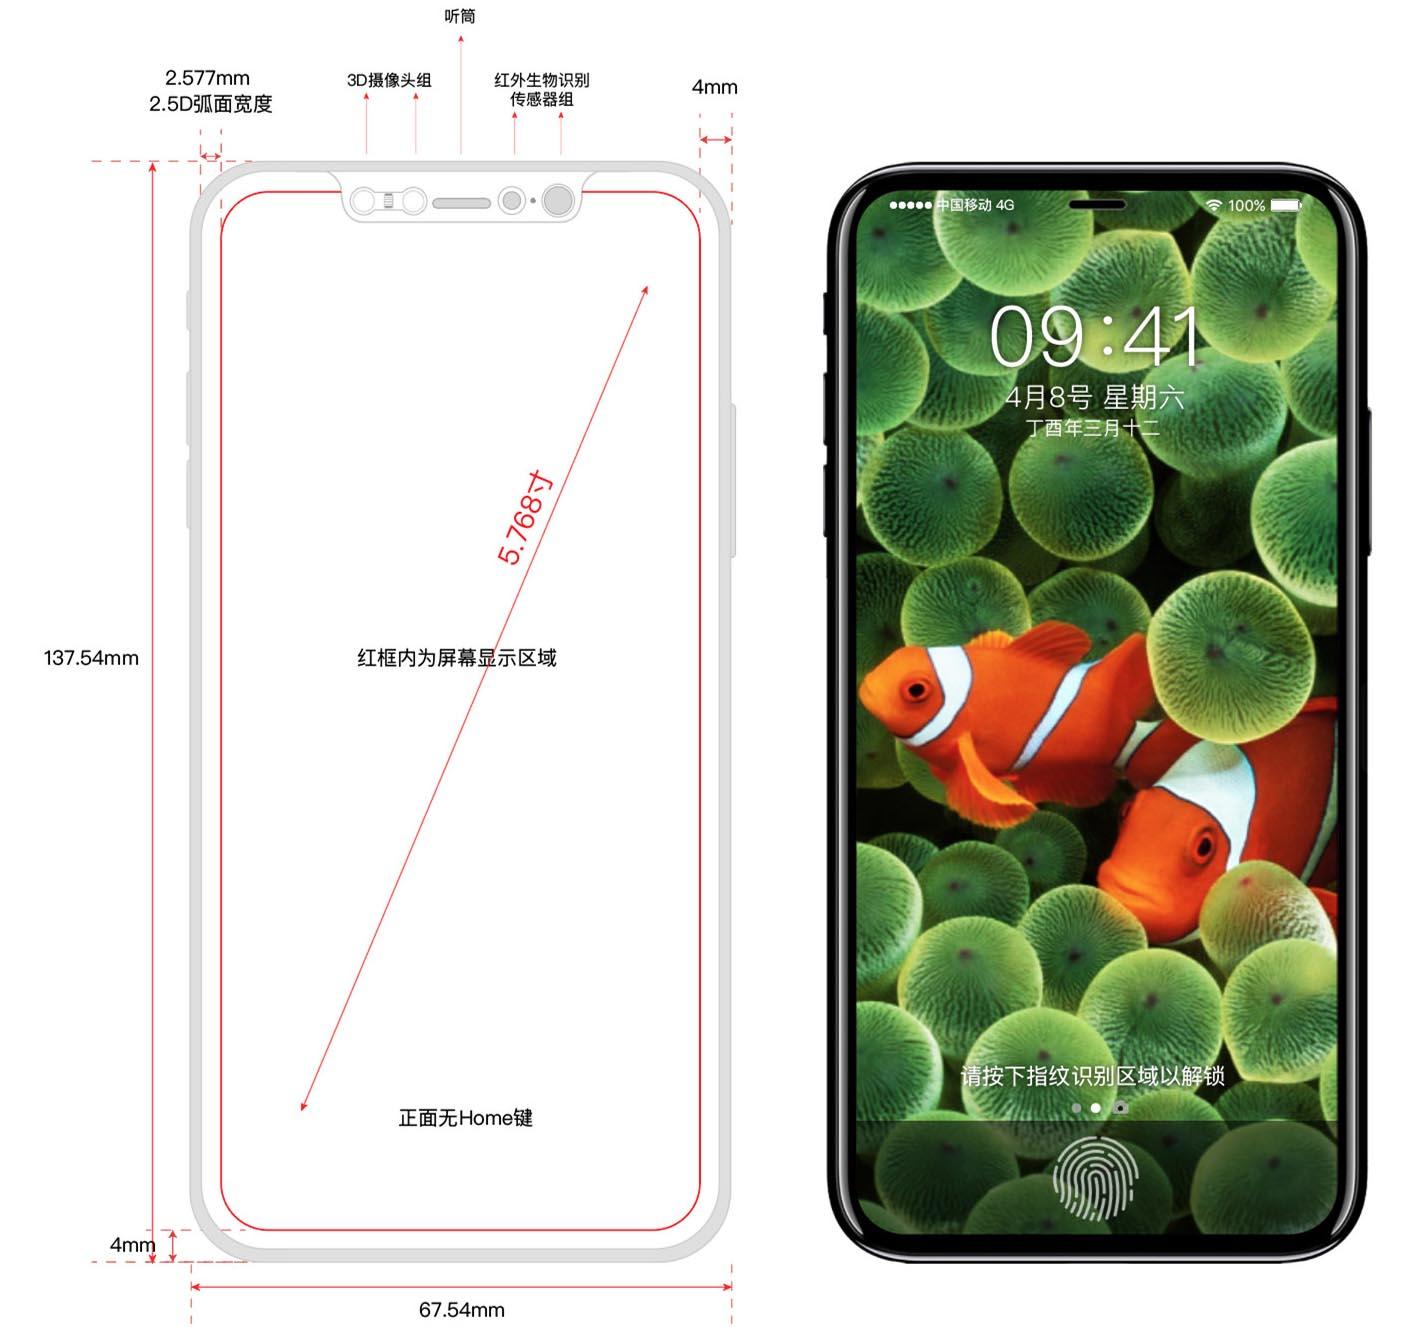 iPhone 8 schéma